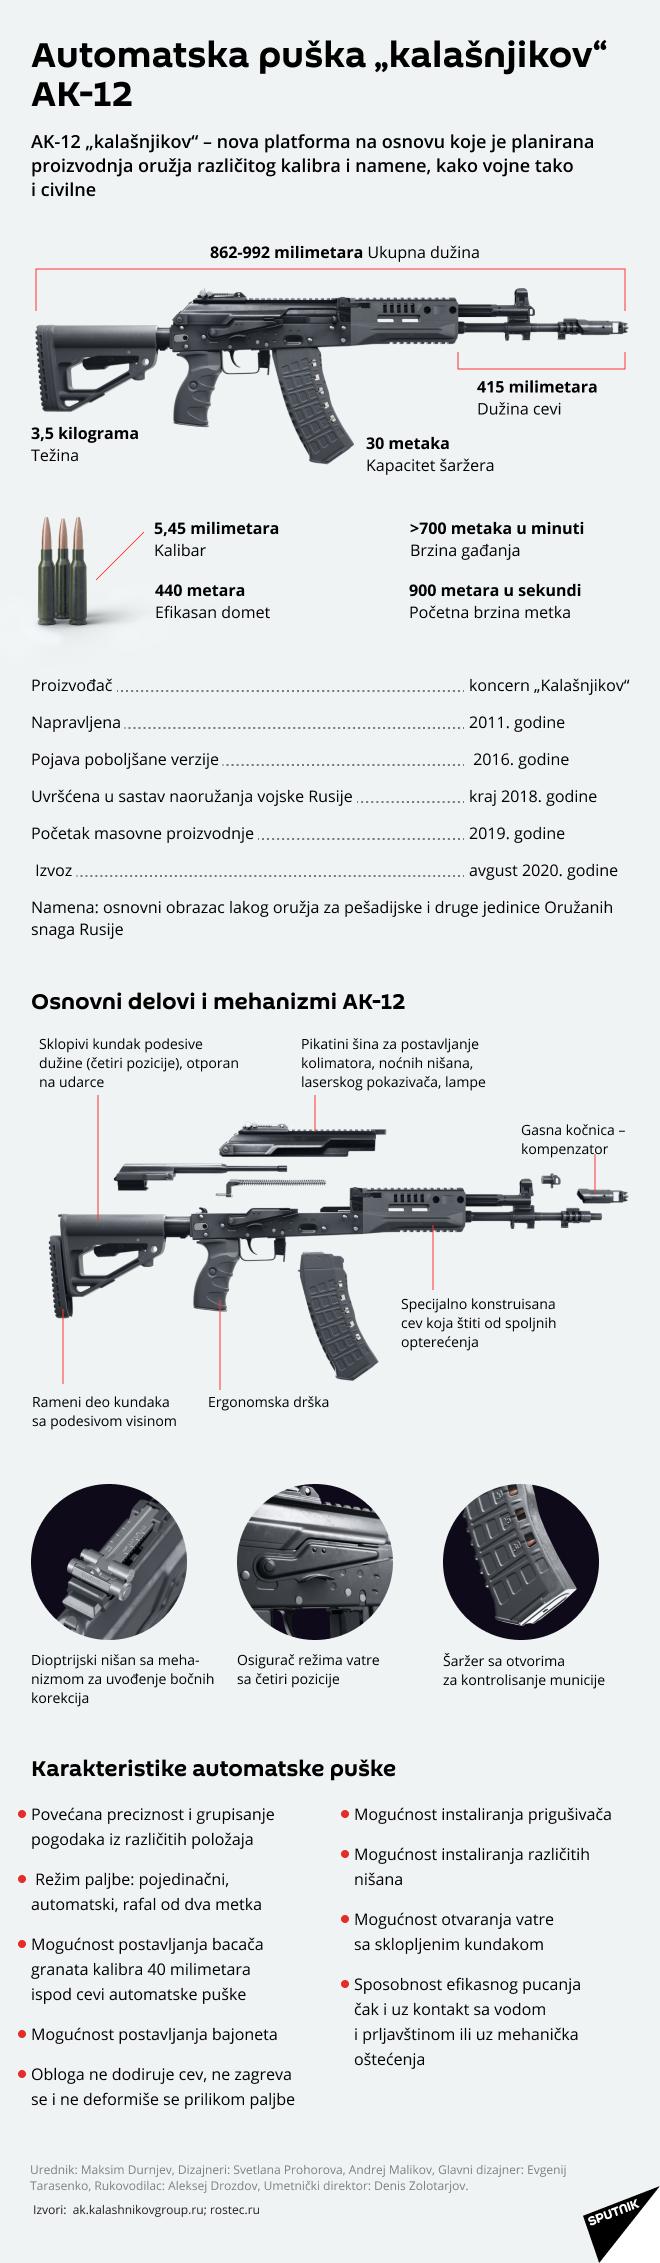 "AK-12 ""kalašnjikov"" LAT. - Sputnik Srbija"